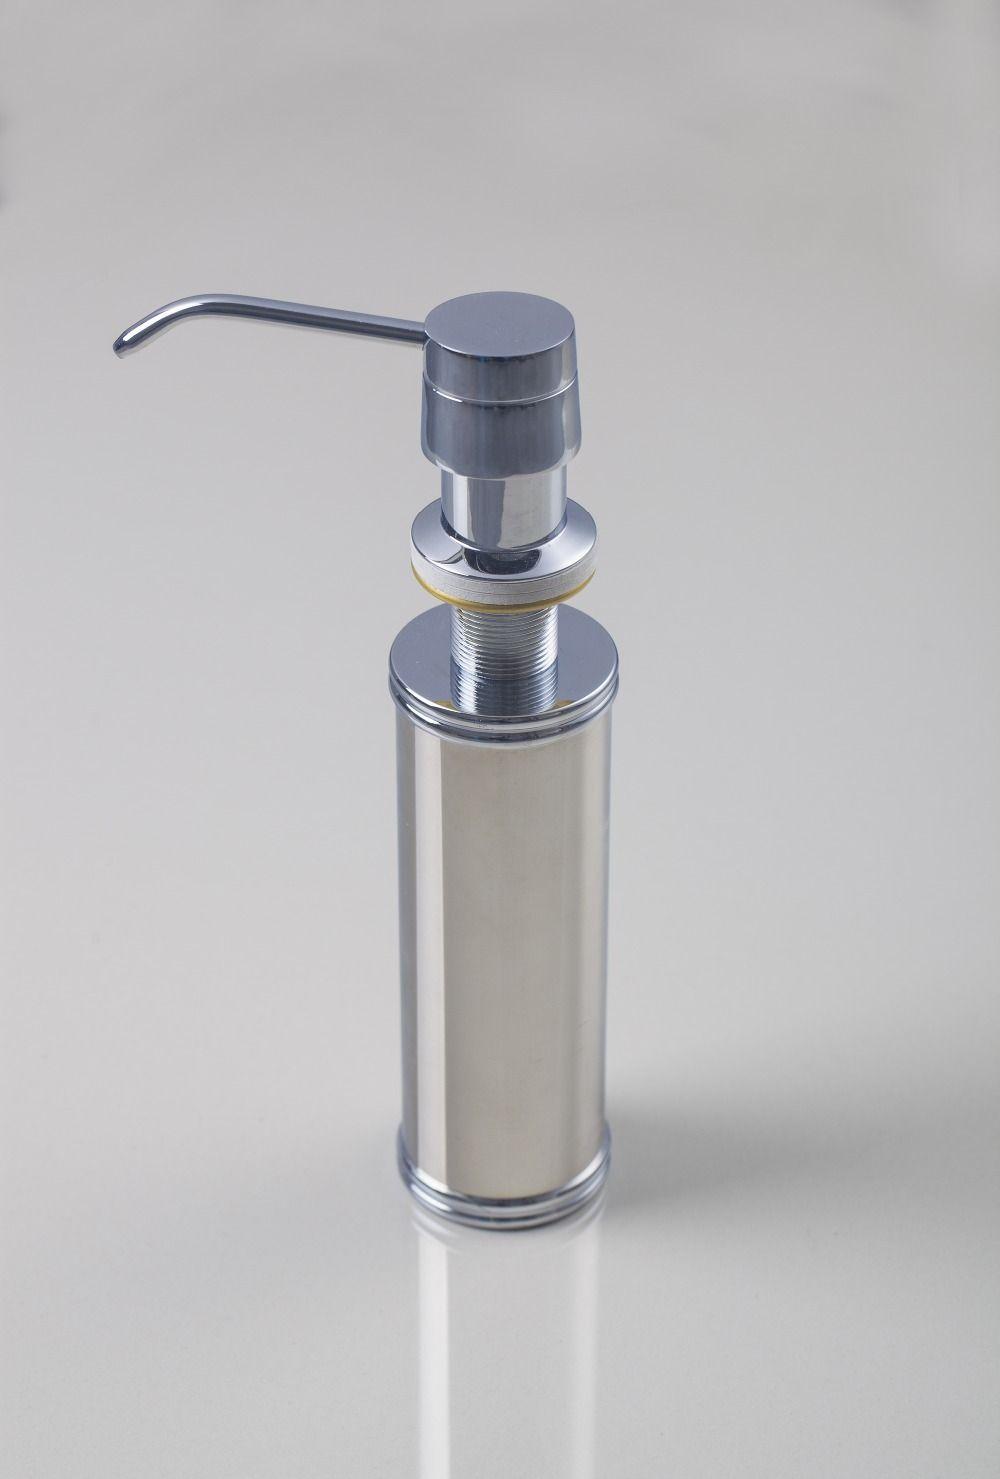 5665 Wholesale And Retail Promotion Kitchen Deck Mounted Chrome Liquid Soap Dispenser Soap Di Sink Soap Dispenser Kitchen Soap Dispenser Replacing Kitchen Sink